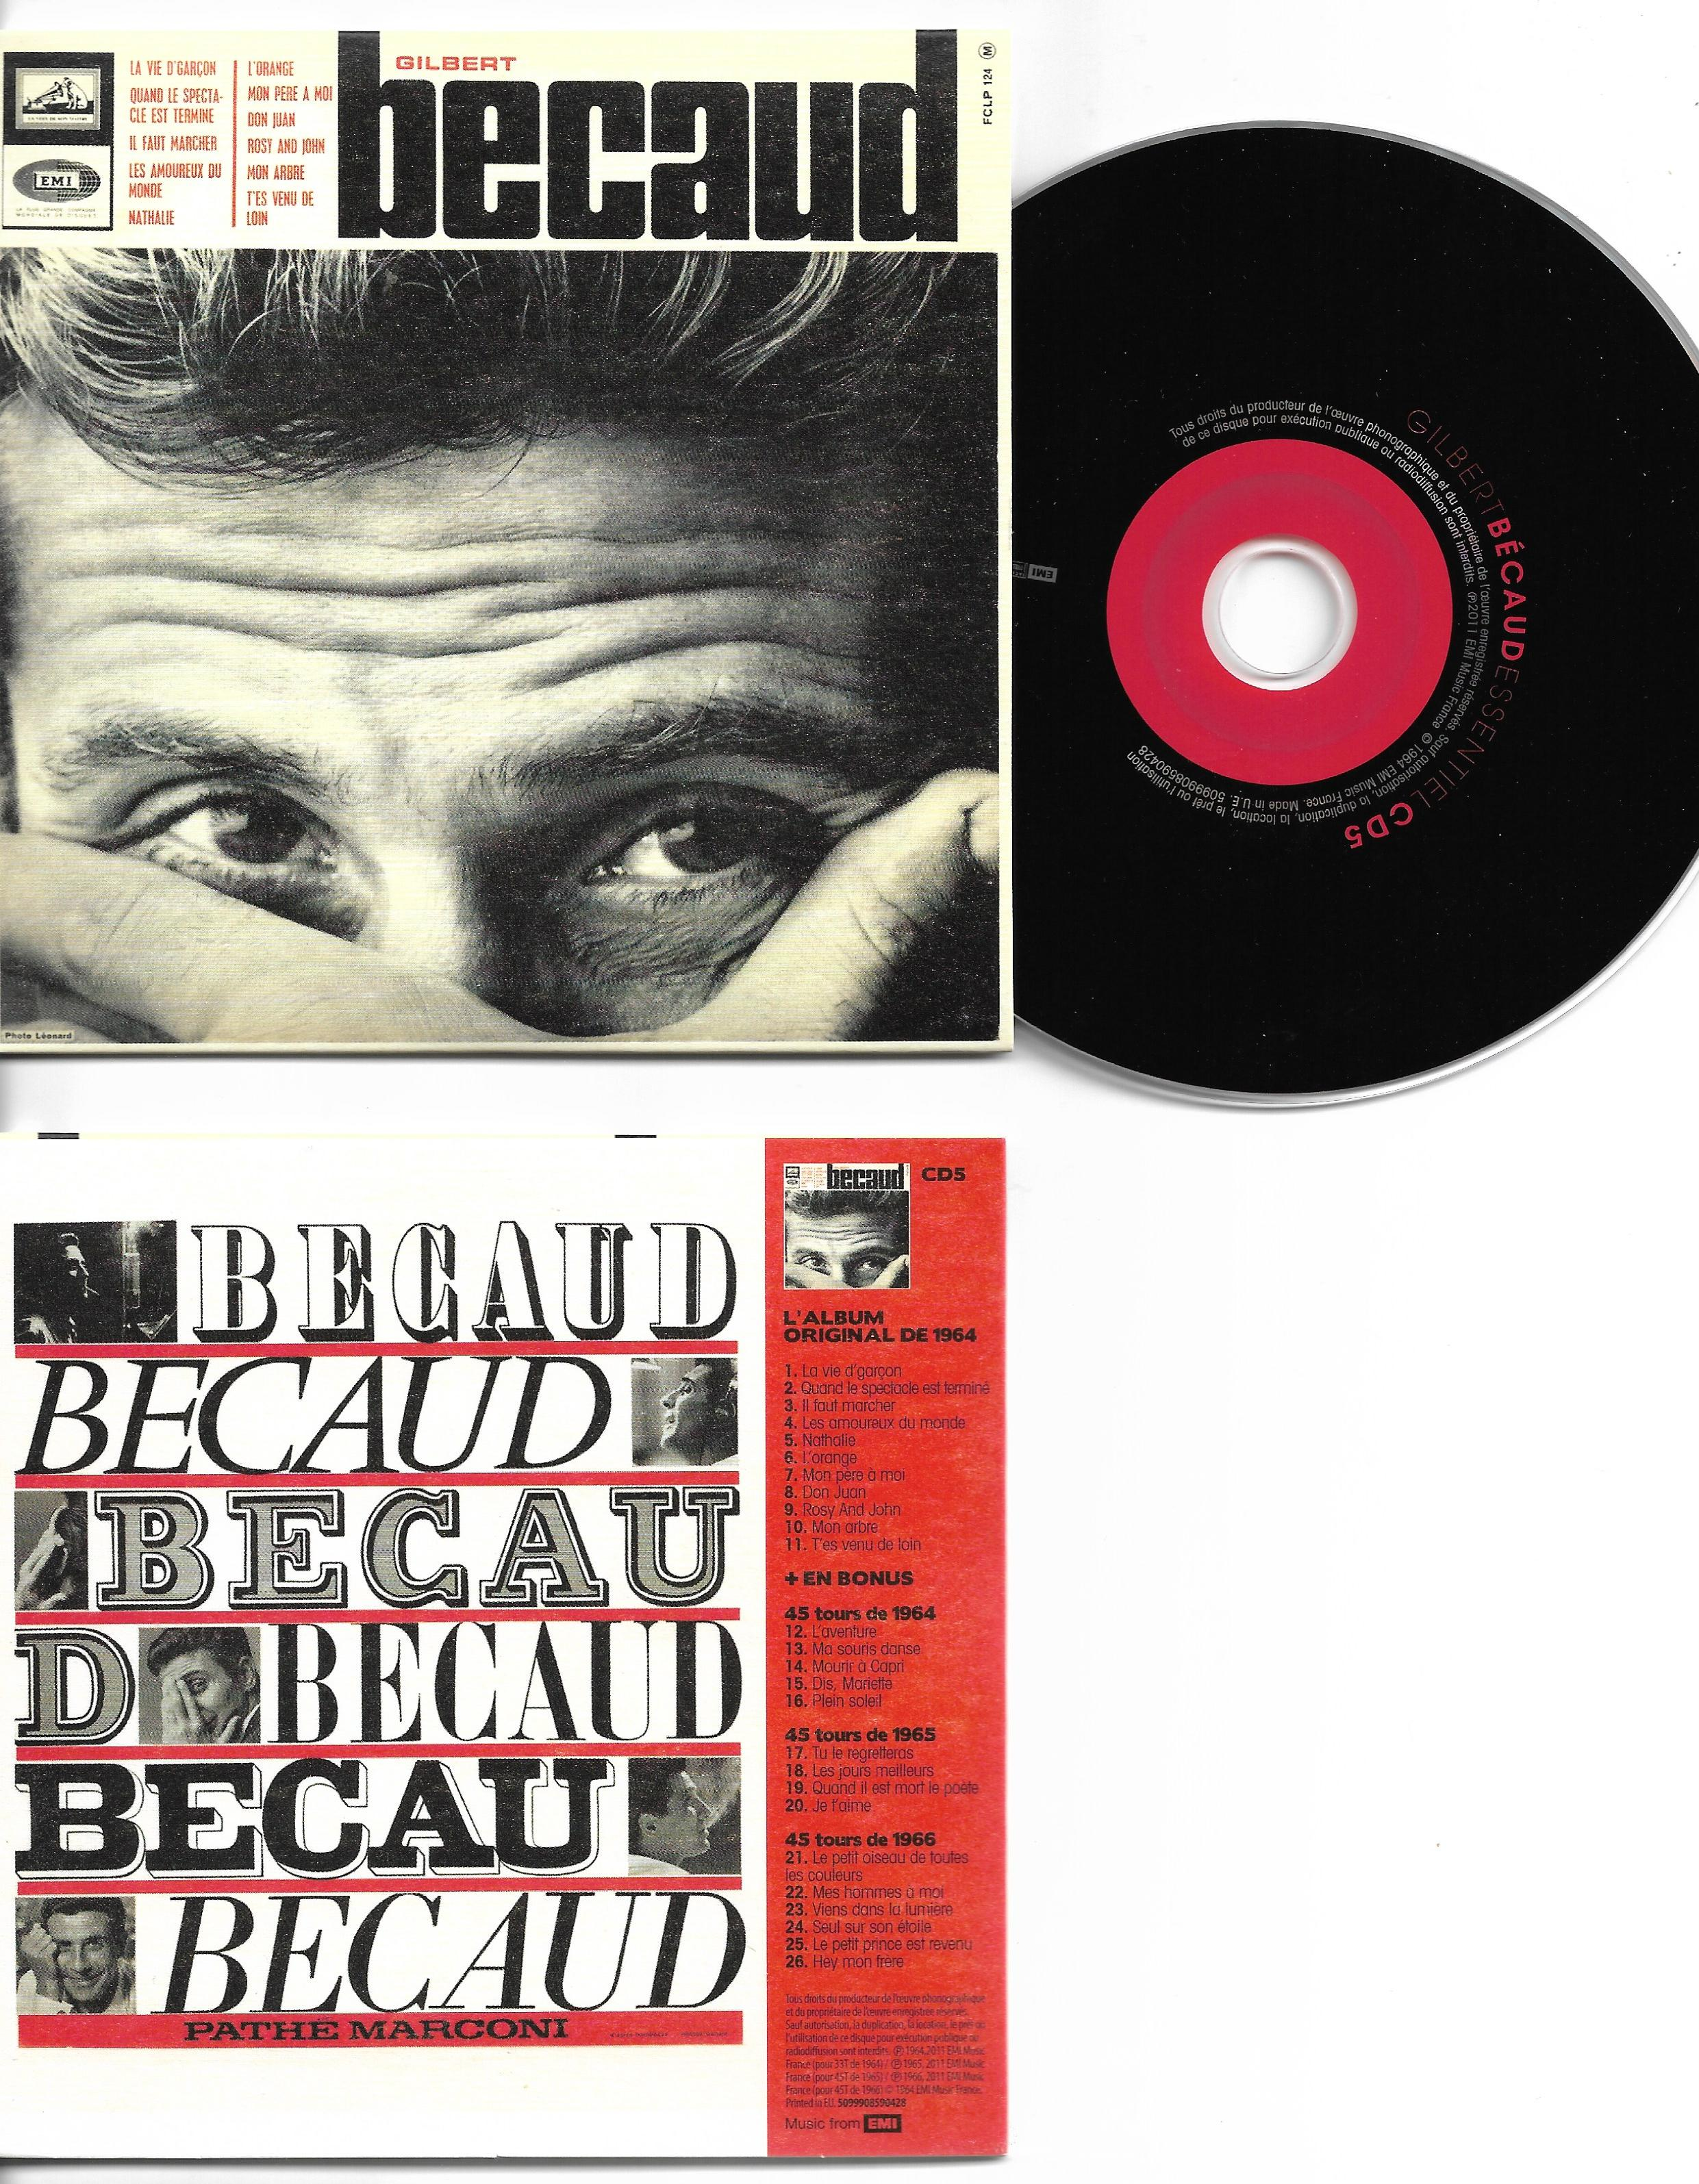 GILBERT BÉCAUD - L'orange (1964 - 1965 - 1966) MINI LP REPLICA CARD SLEEVE 26-TRACK - CD